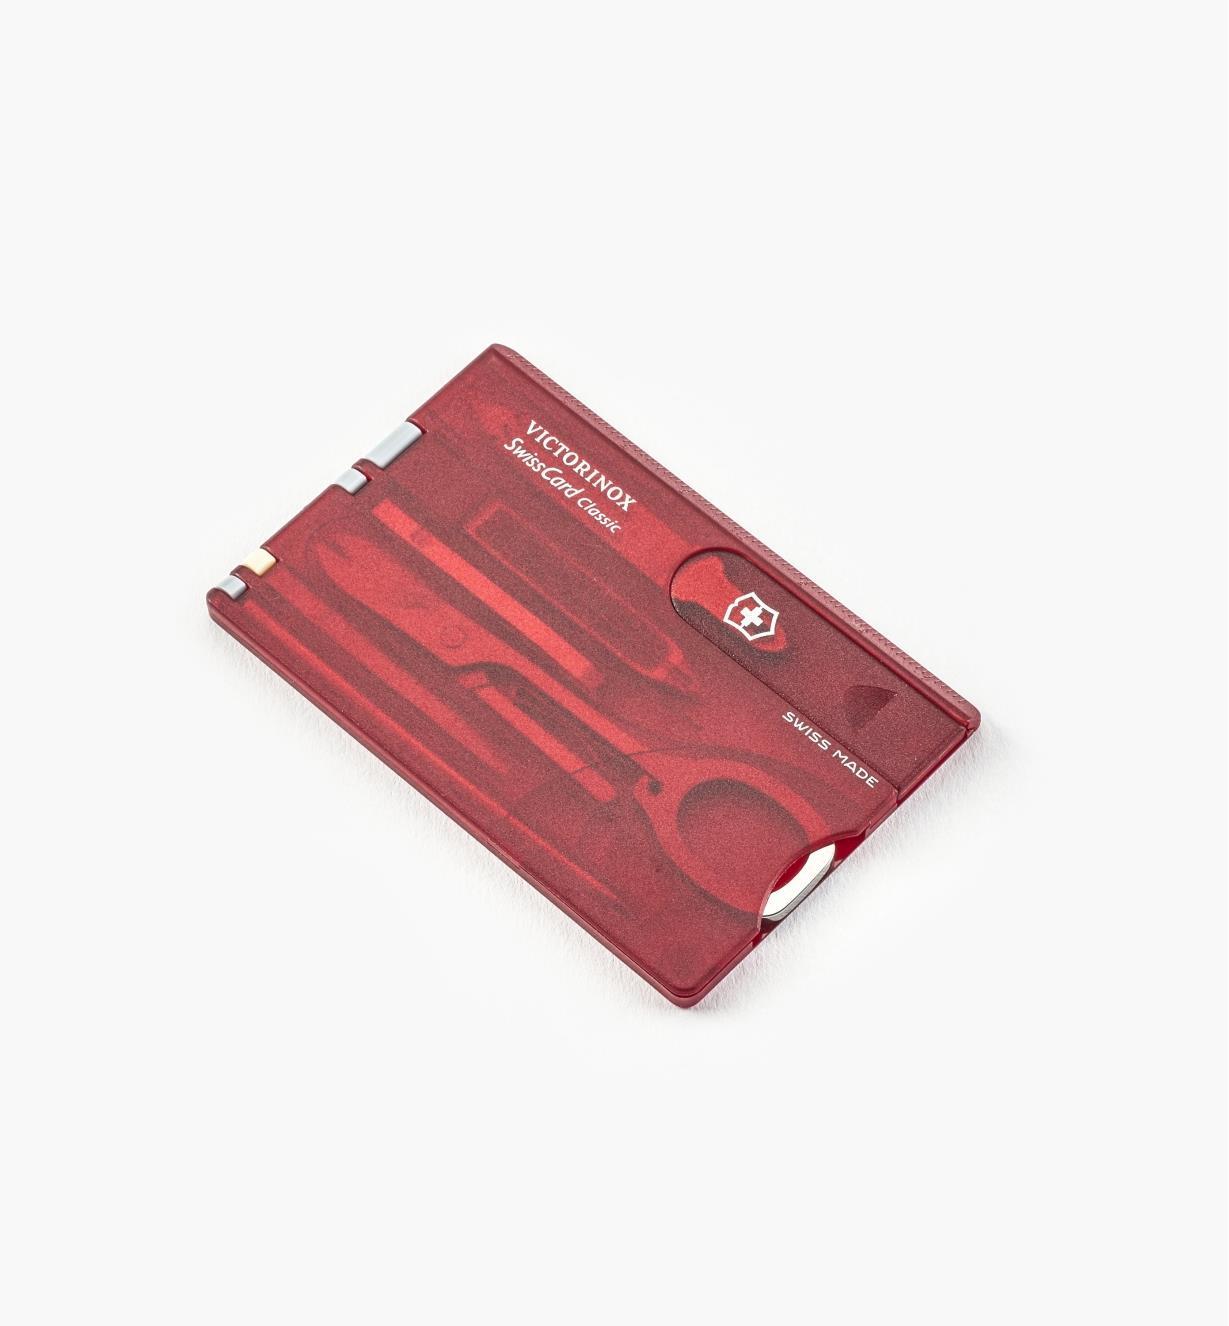 33N0770 - Victorinox Swiss Card